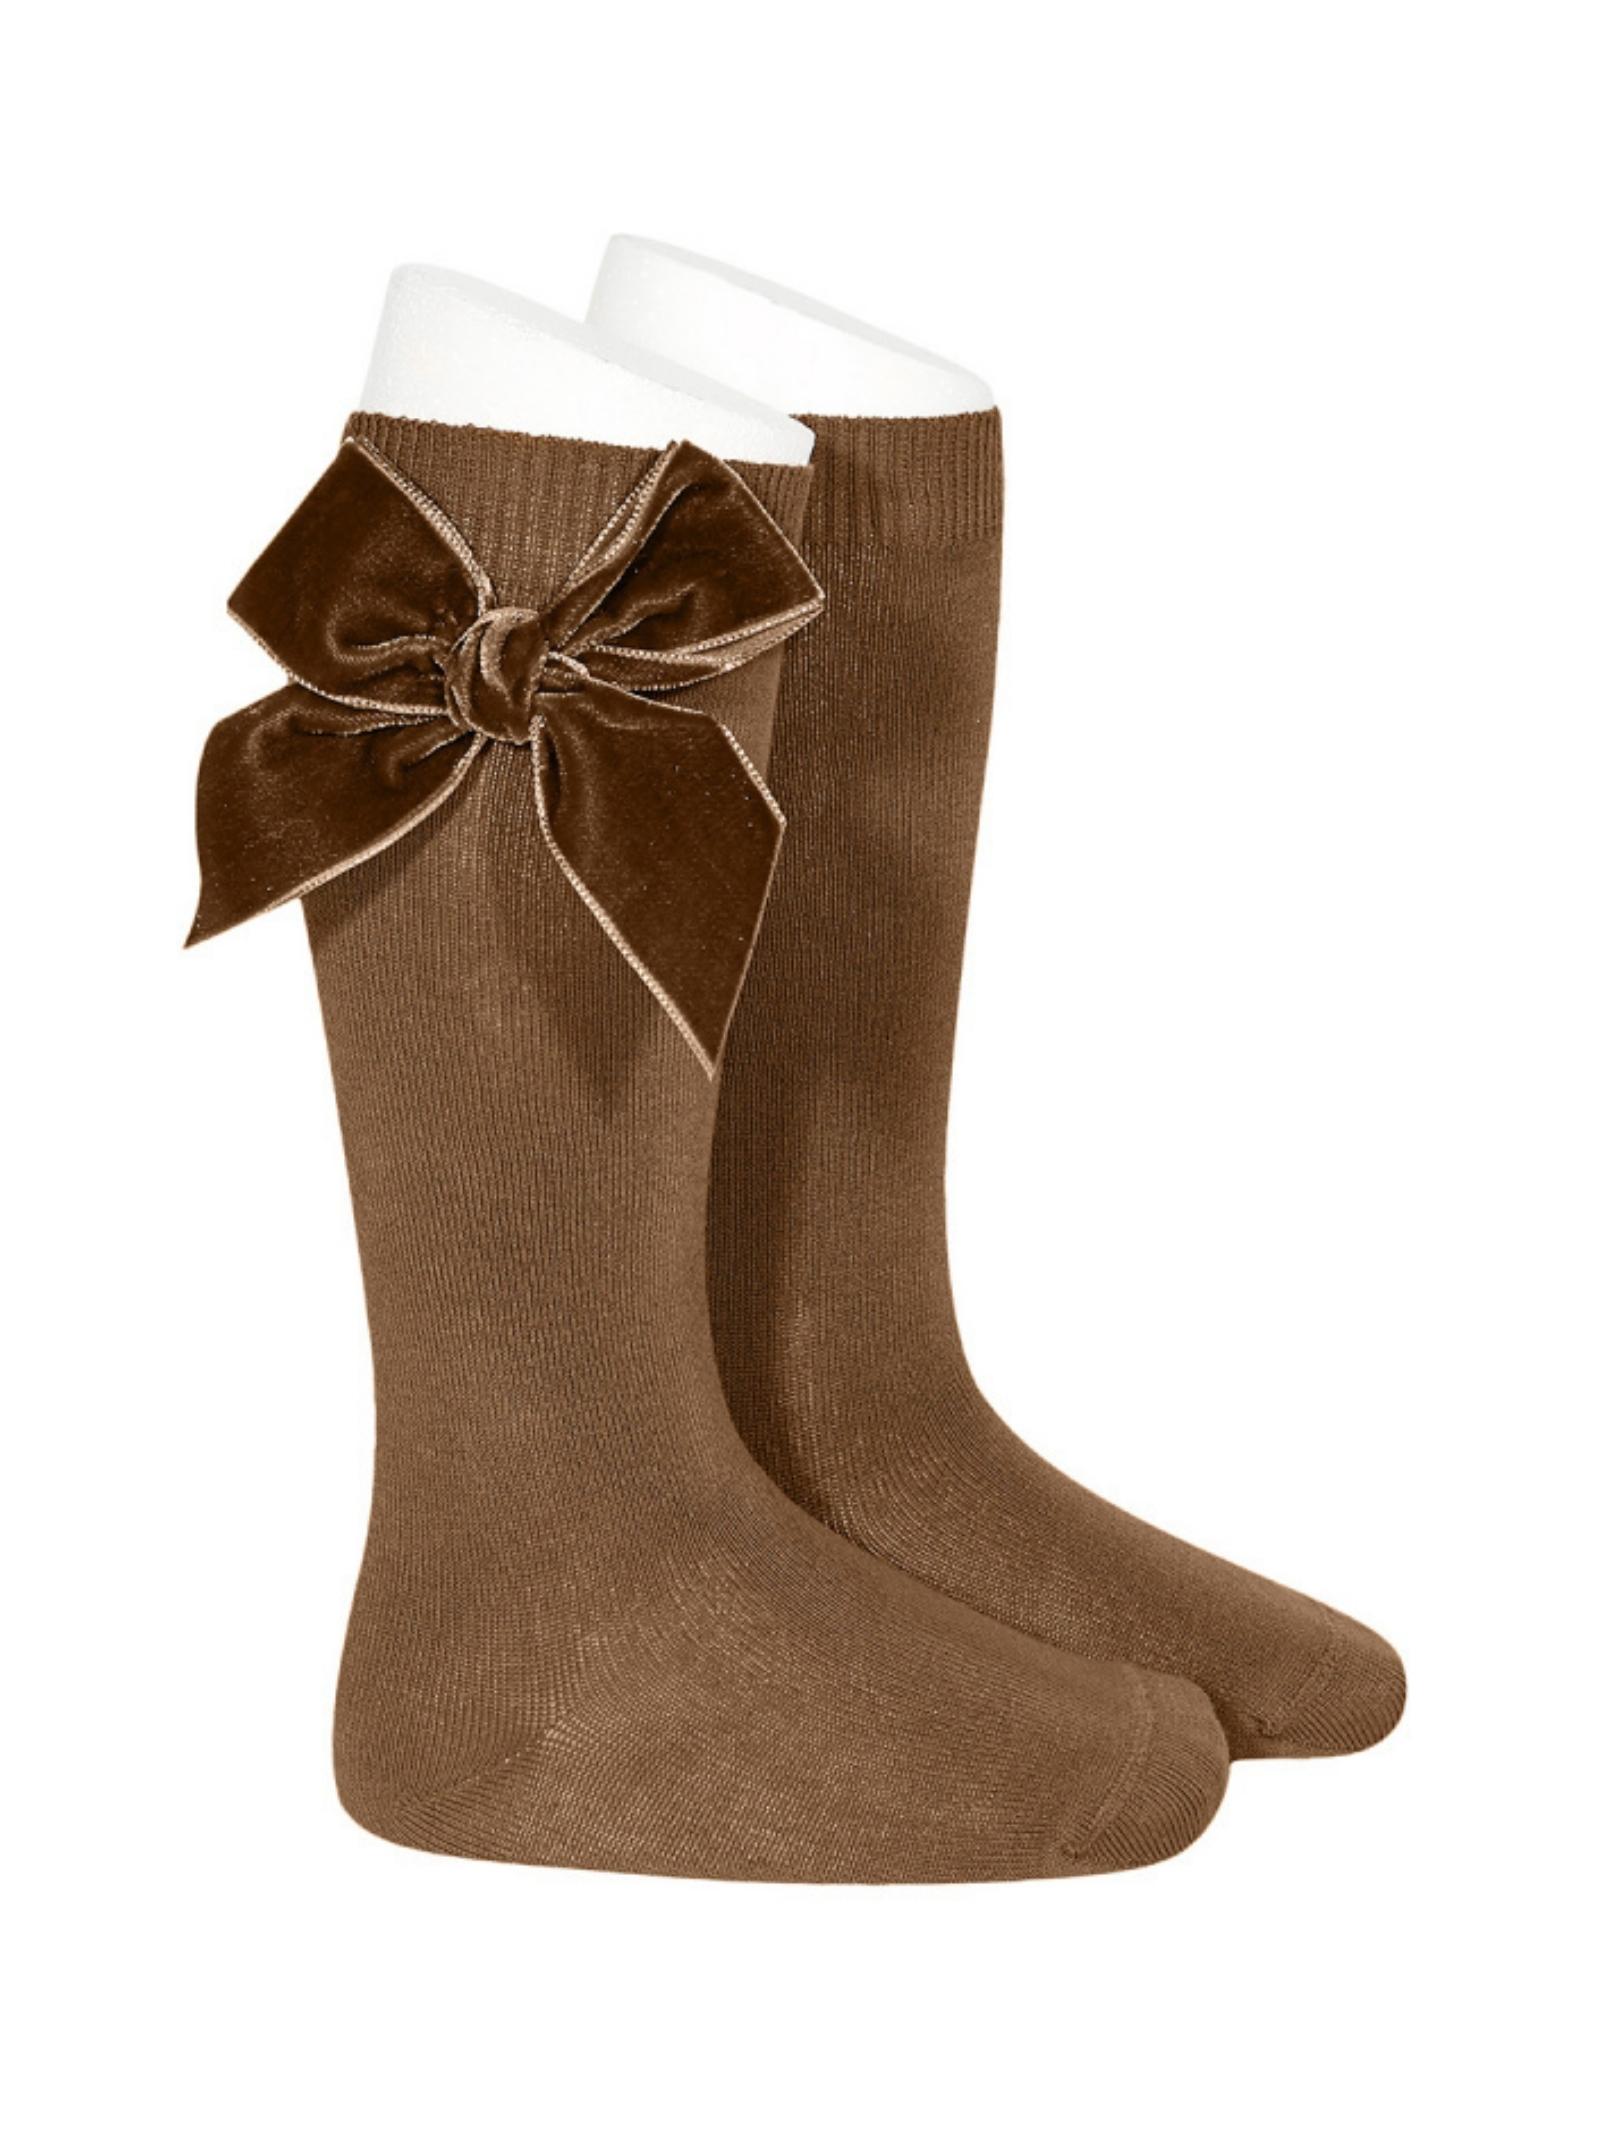 Parisian Bow Socks for Girls CONDOR | Socks | 24892897